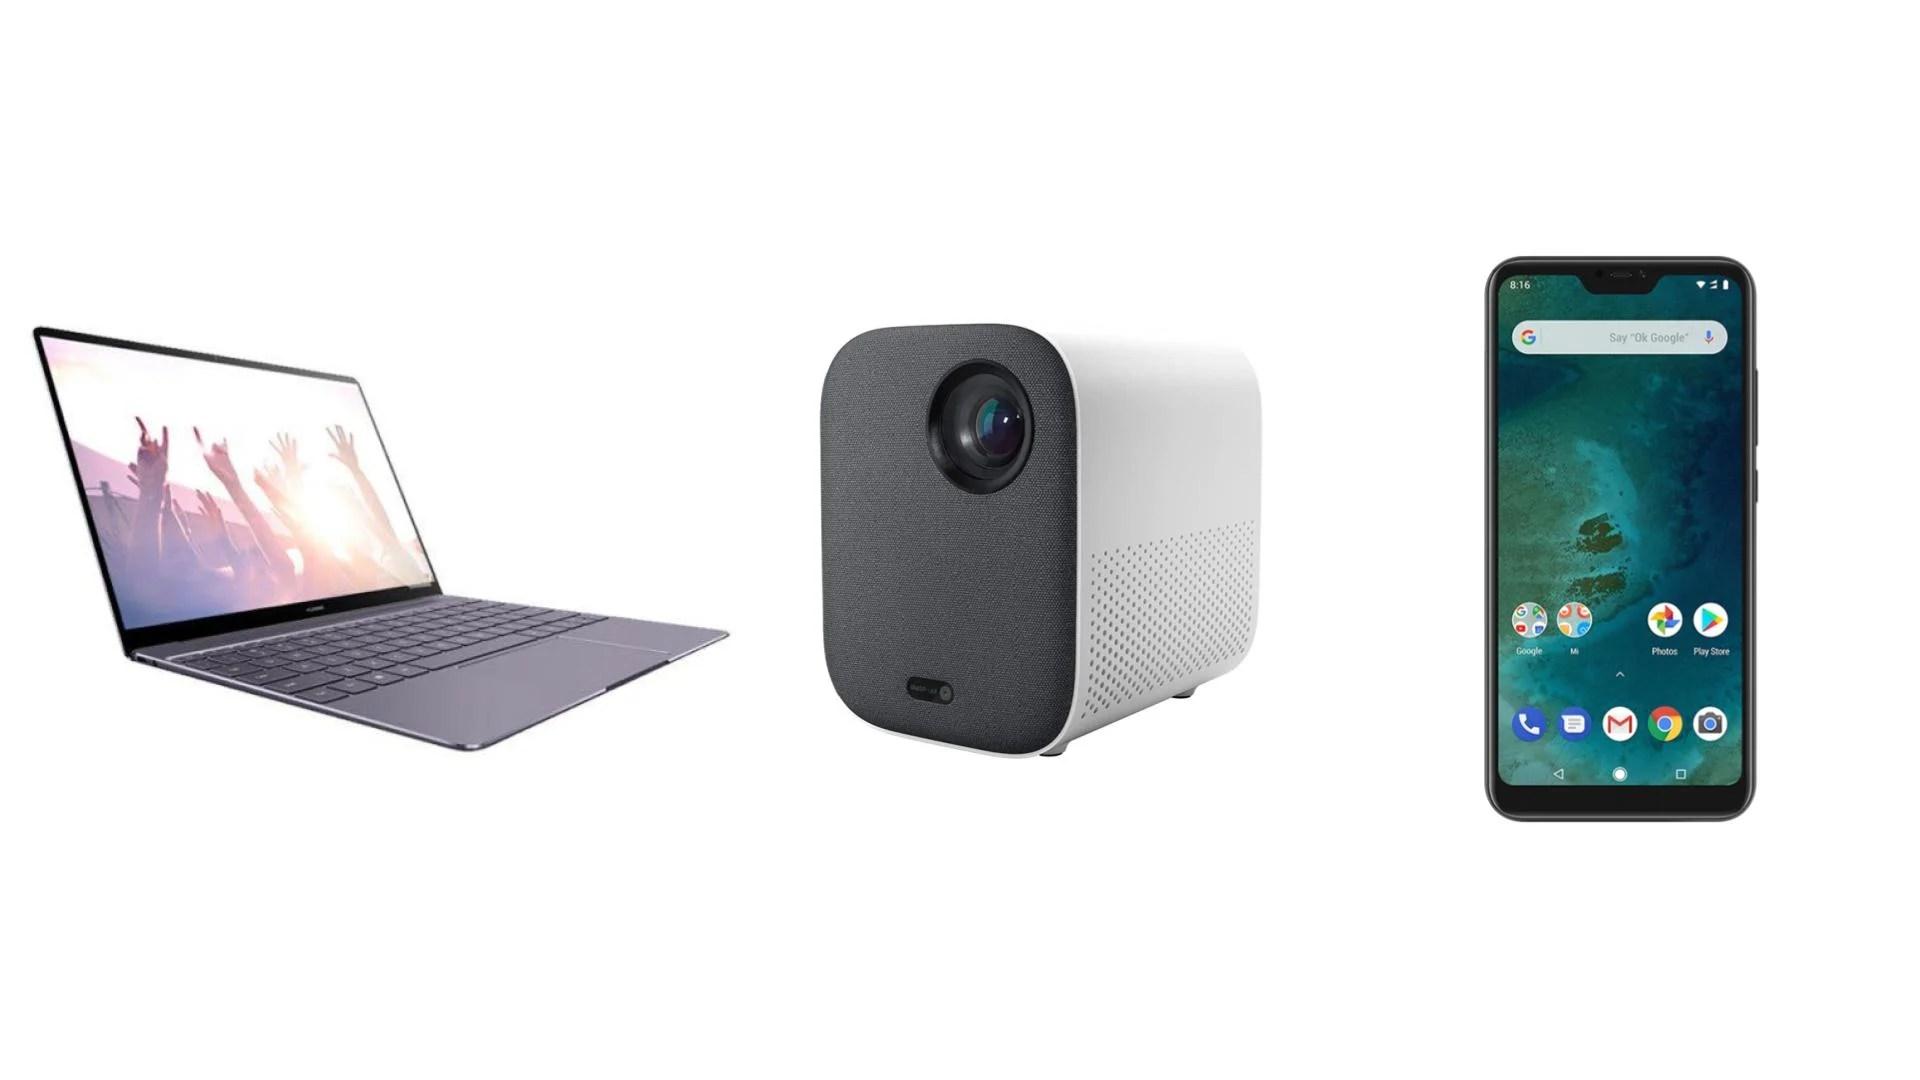 Huawei MateBook 13″ à 708 euros, projecteur 1080p Xiaomi à 469 euros et Xiaomi Mi A2 Lite 64 Go à 168 euros sur GearBest